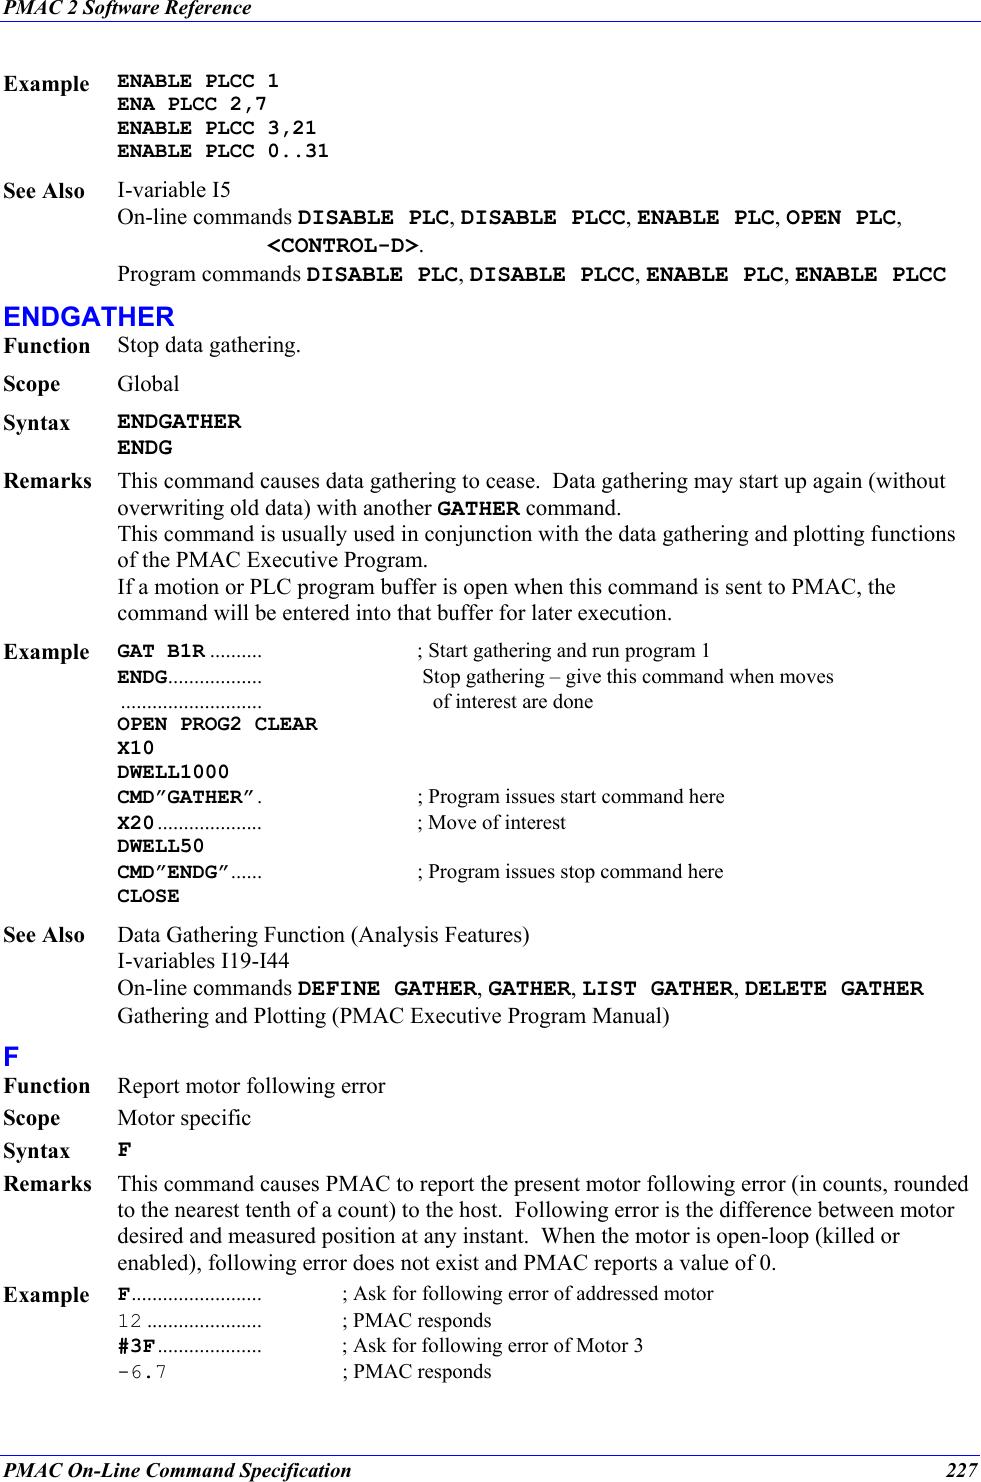 Delta Tau Pmac Mini Pci Reference Manual And PMAC2 Software